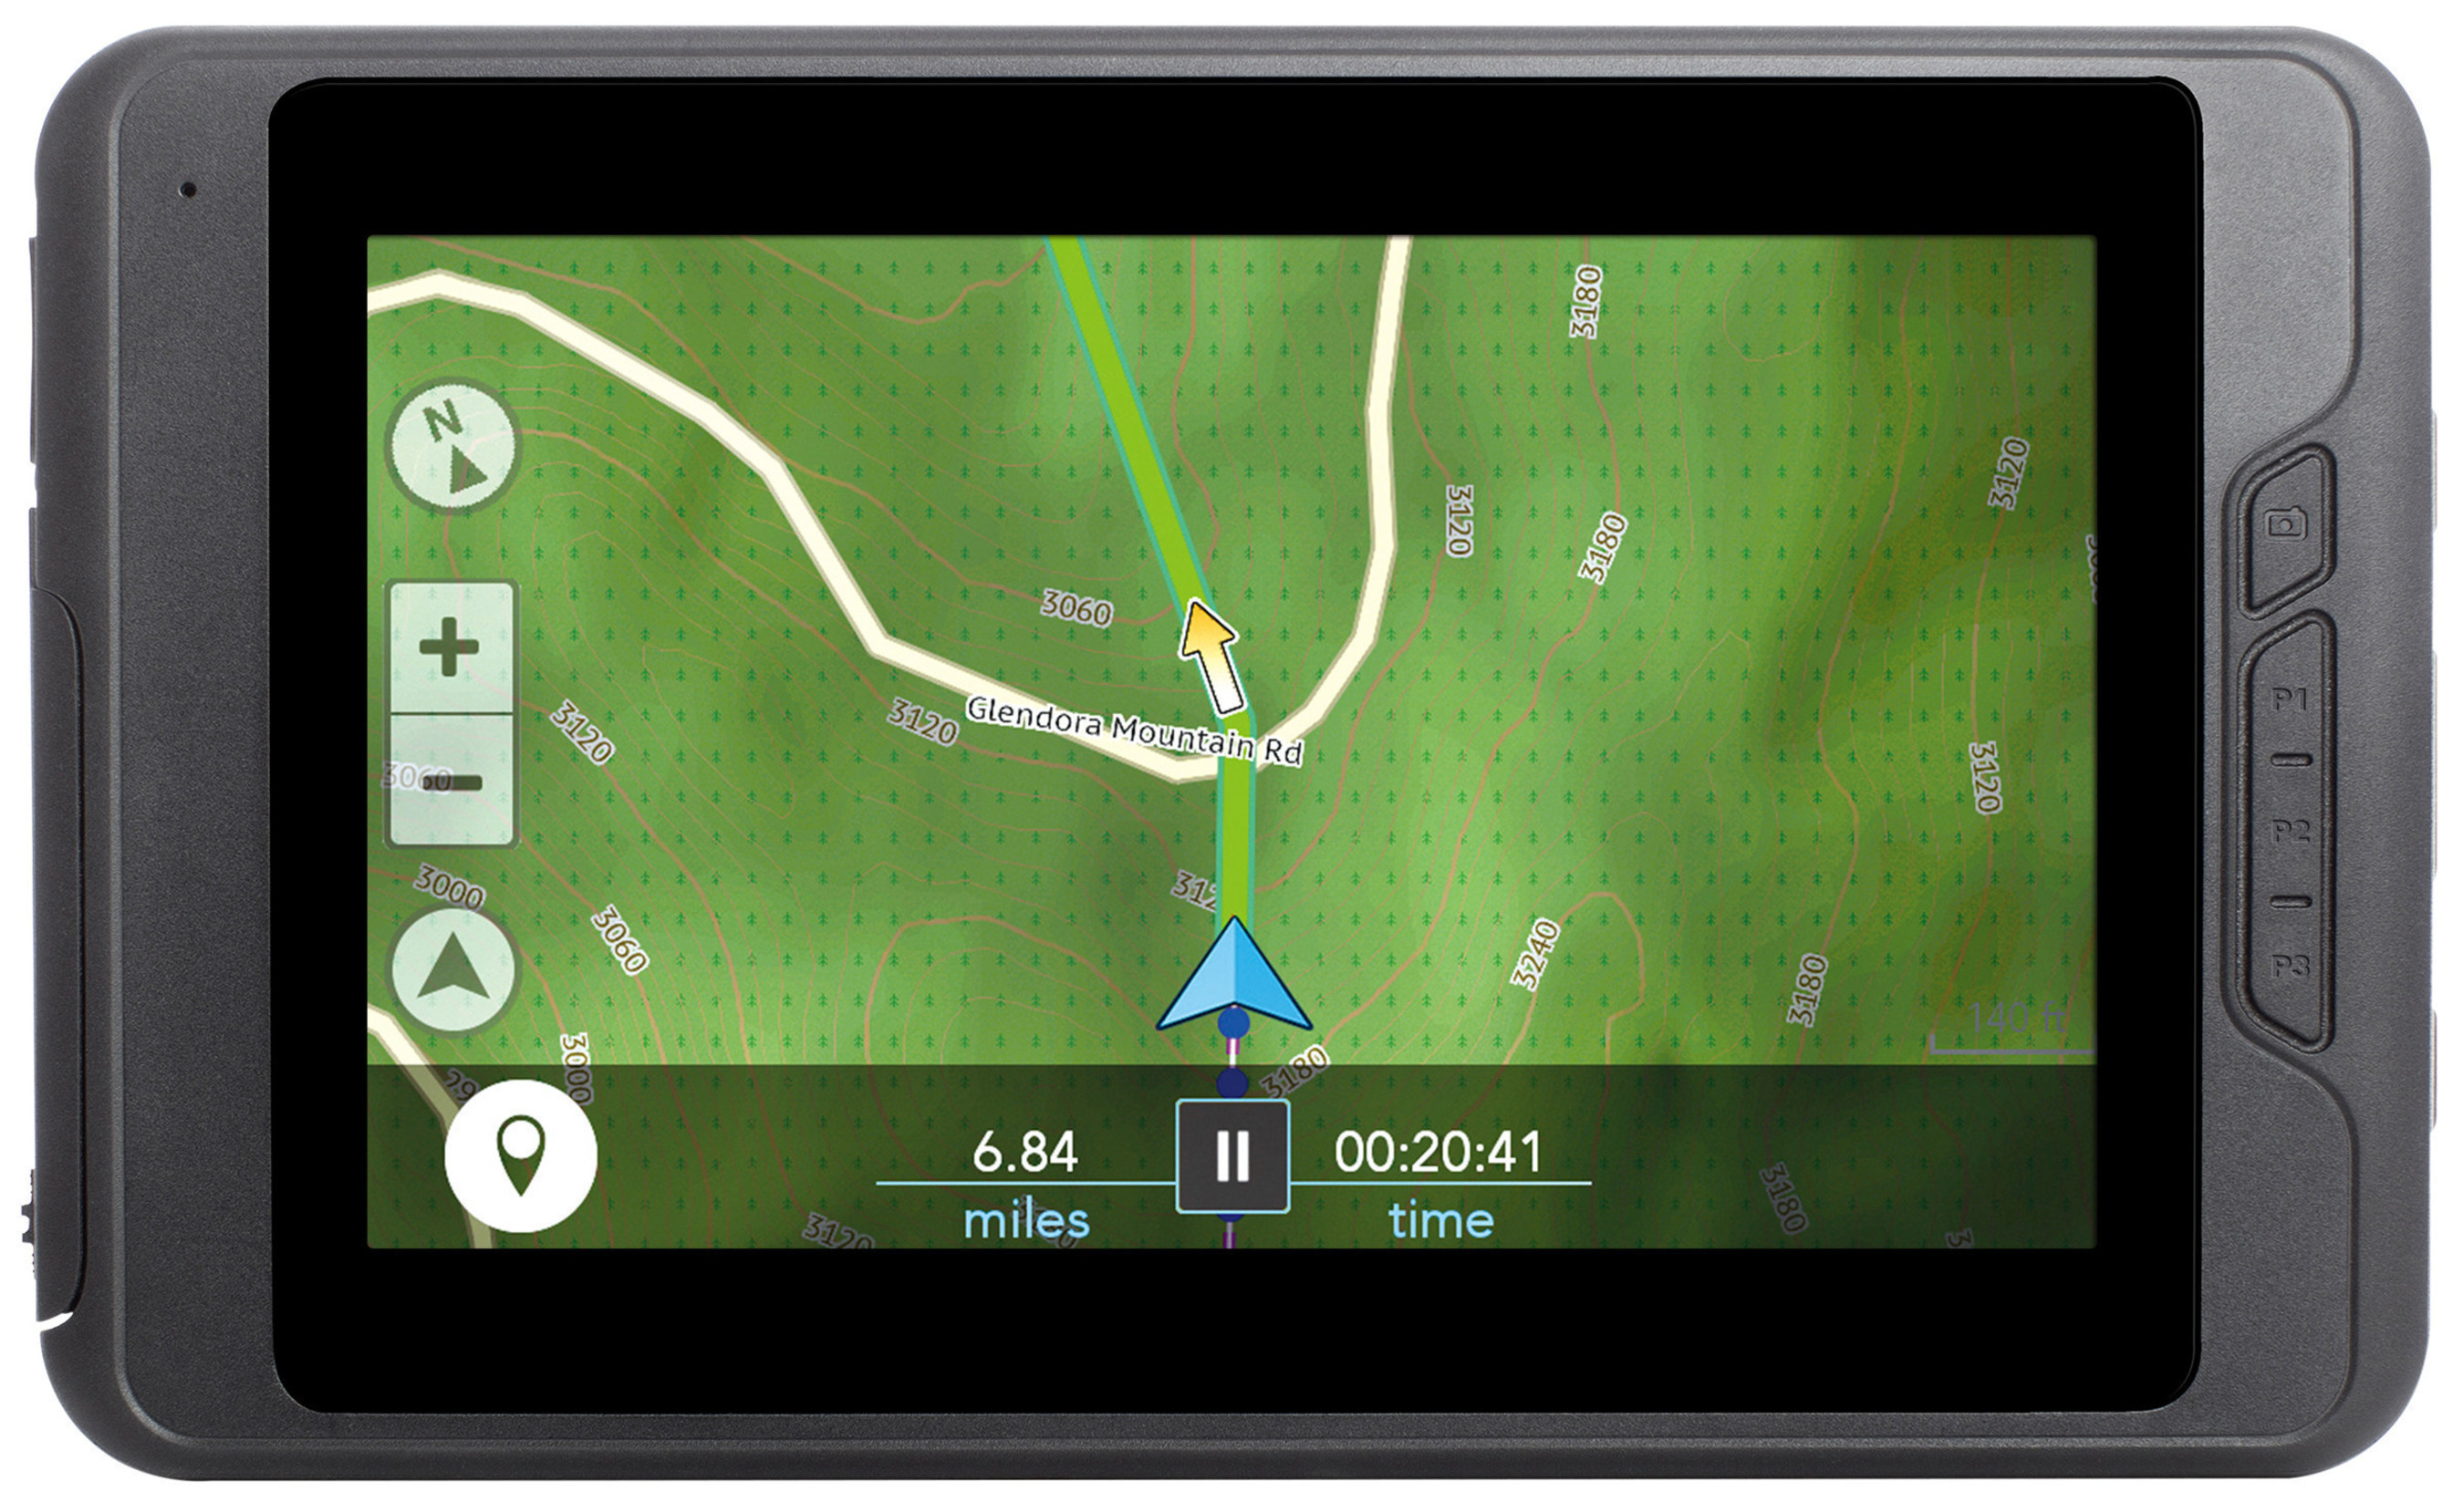 Magellan to Demo its eXplorist TRX7 Off-Road GPS Navigator at the